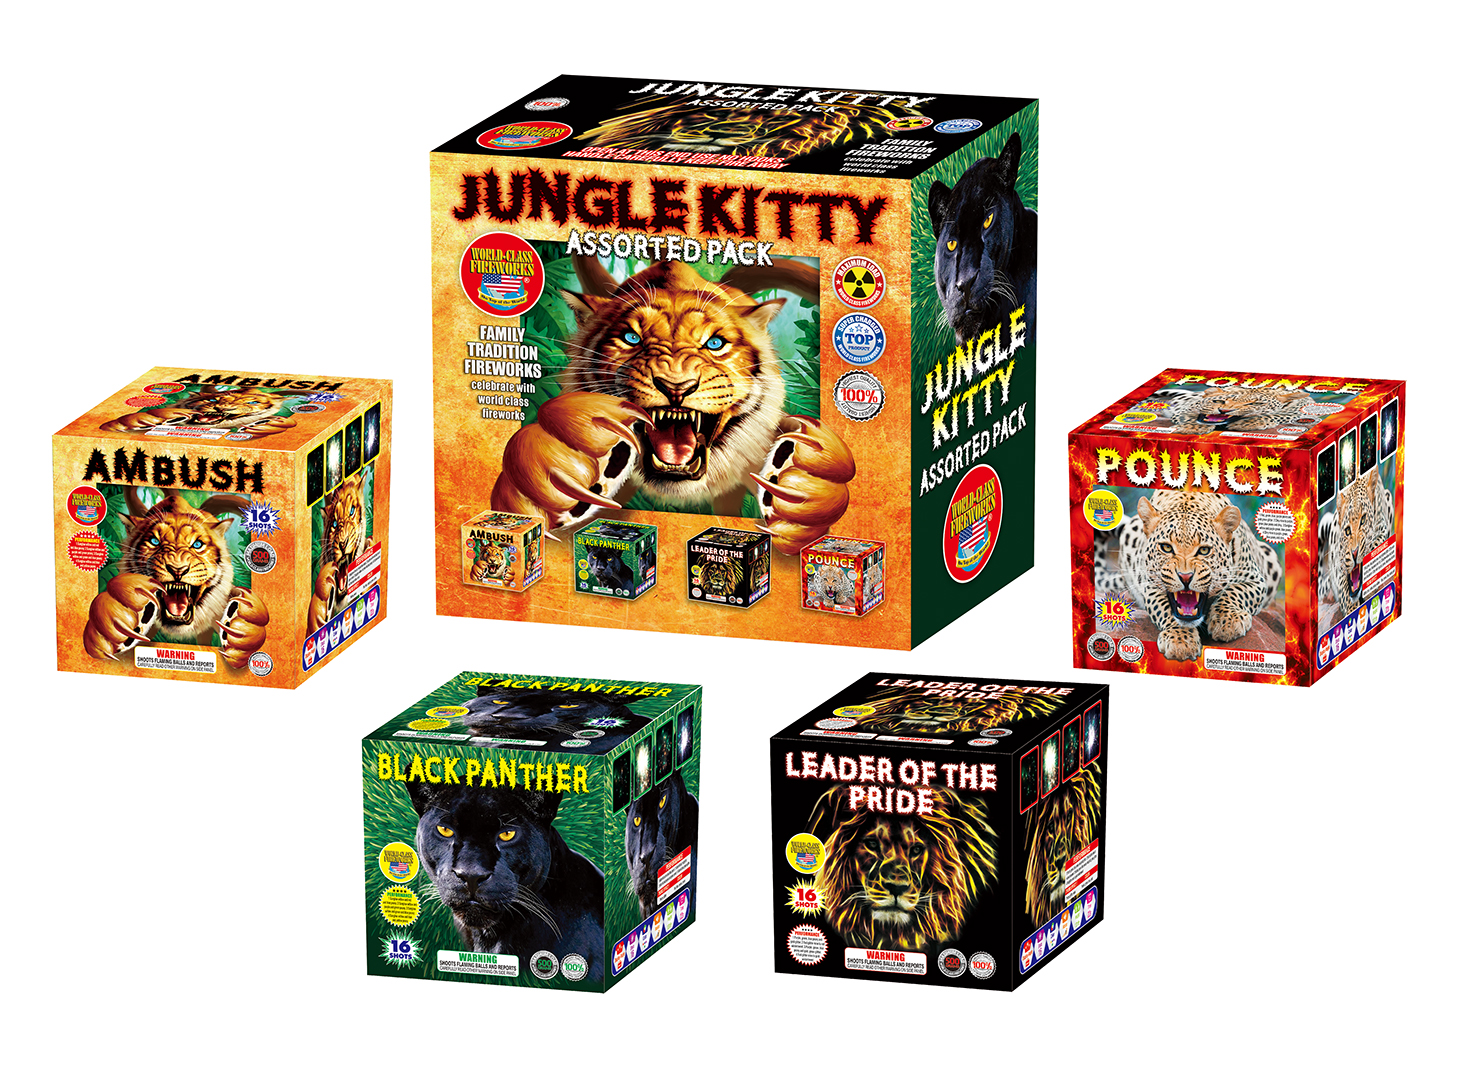 Jungle Kitty Assortment